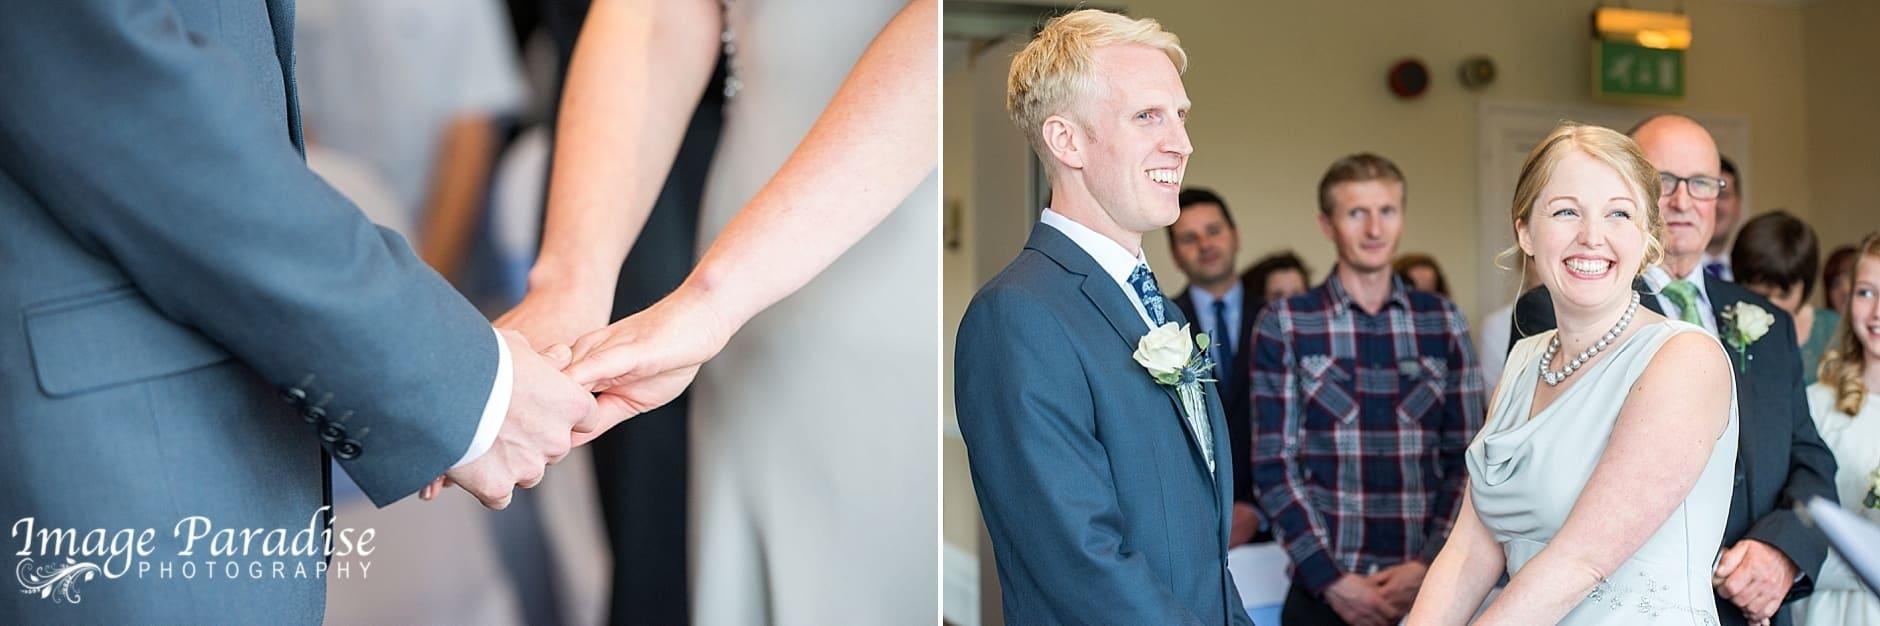 wedding ceremony at the Avon Gorge Hotel